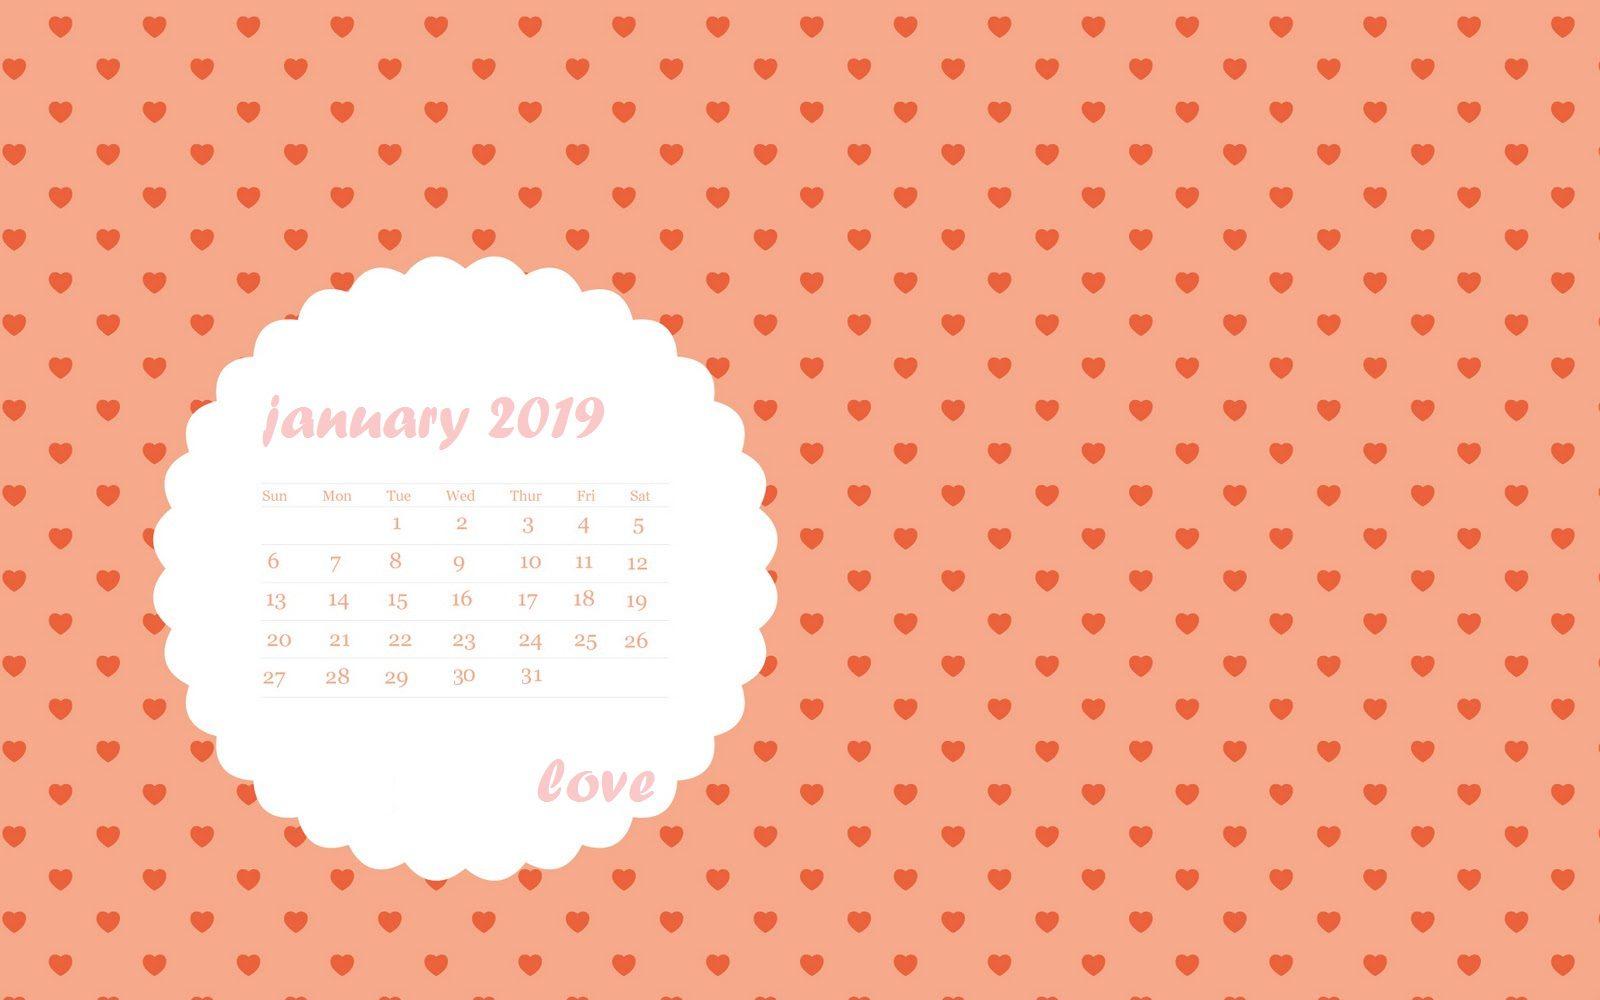 Heart Love January 2019 Desktop Calendar